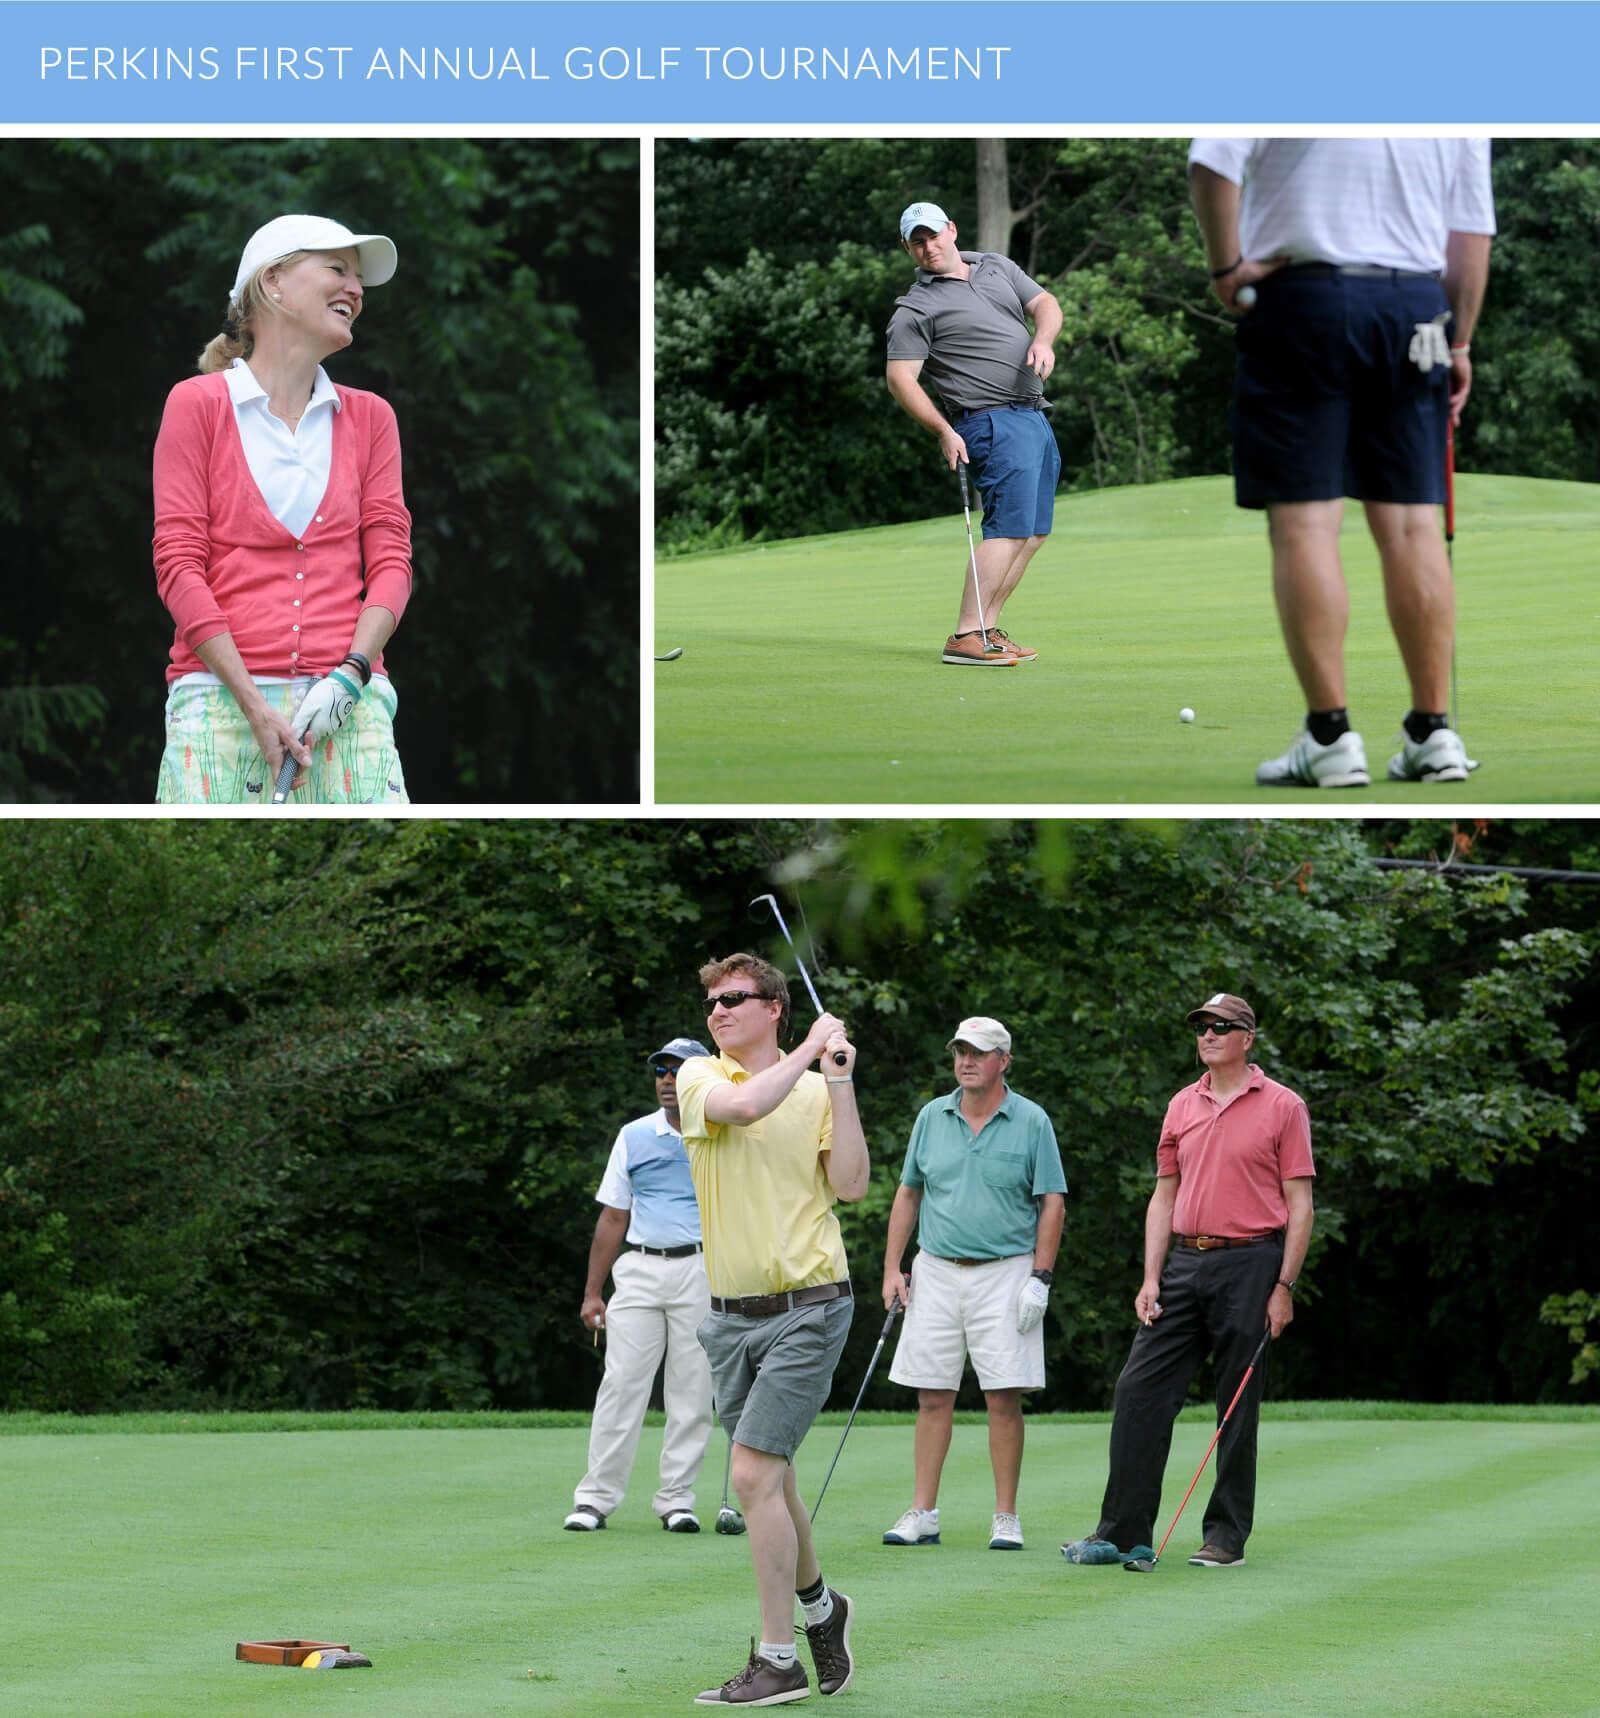 Perkins Golf